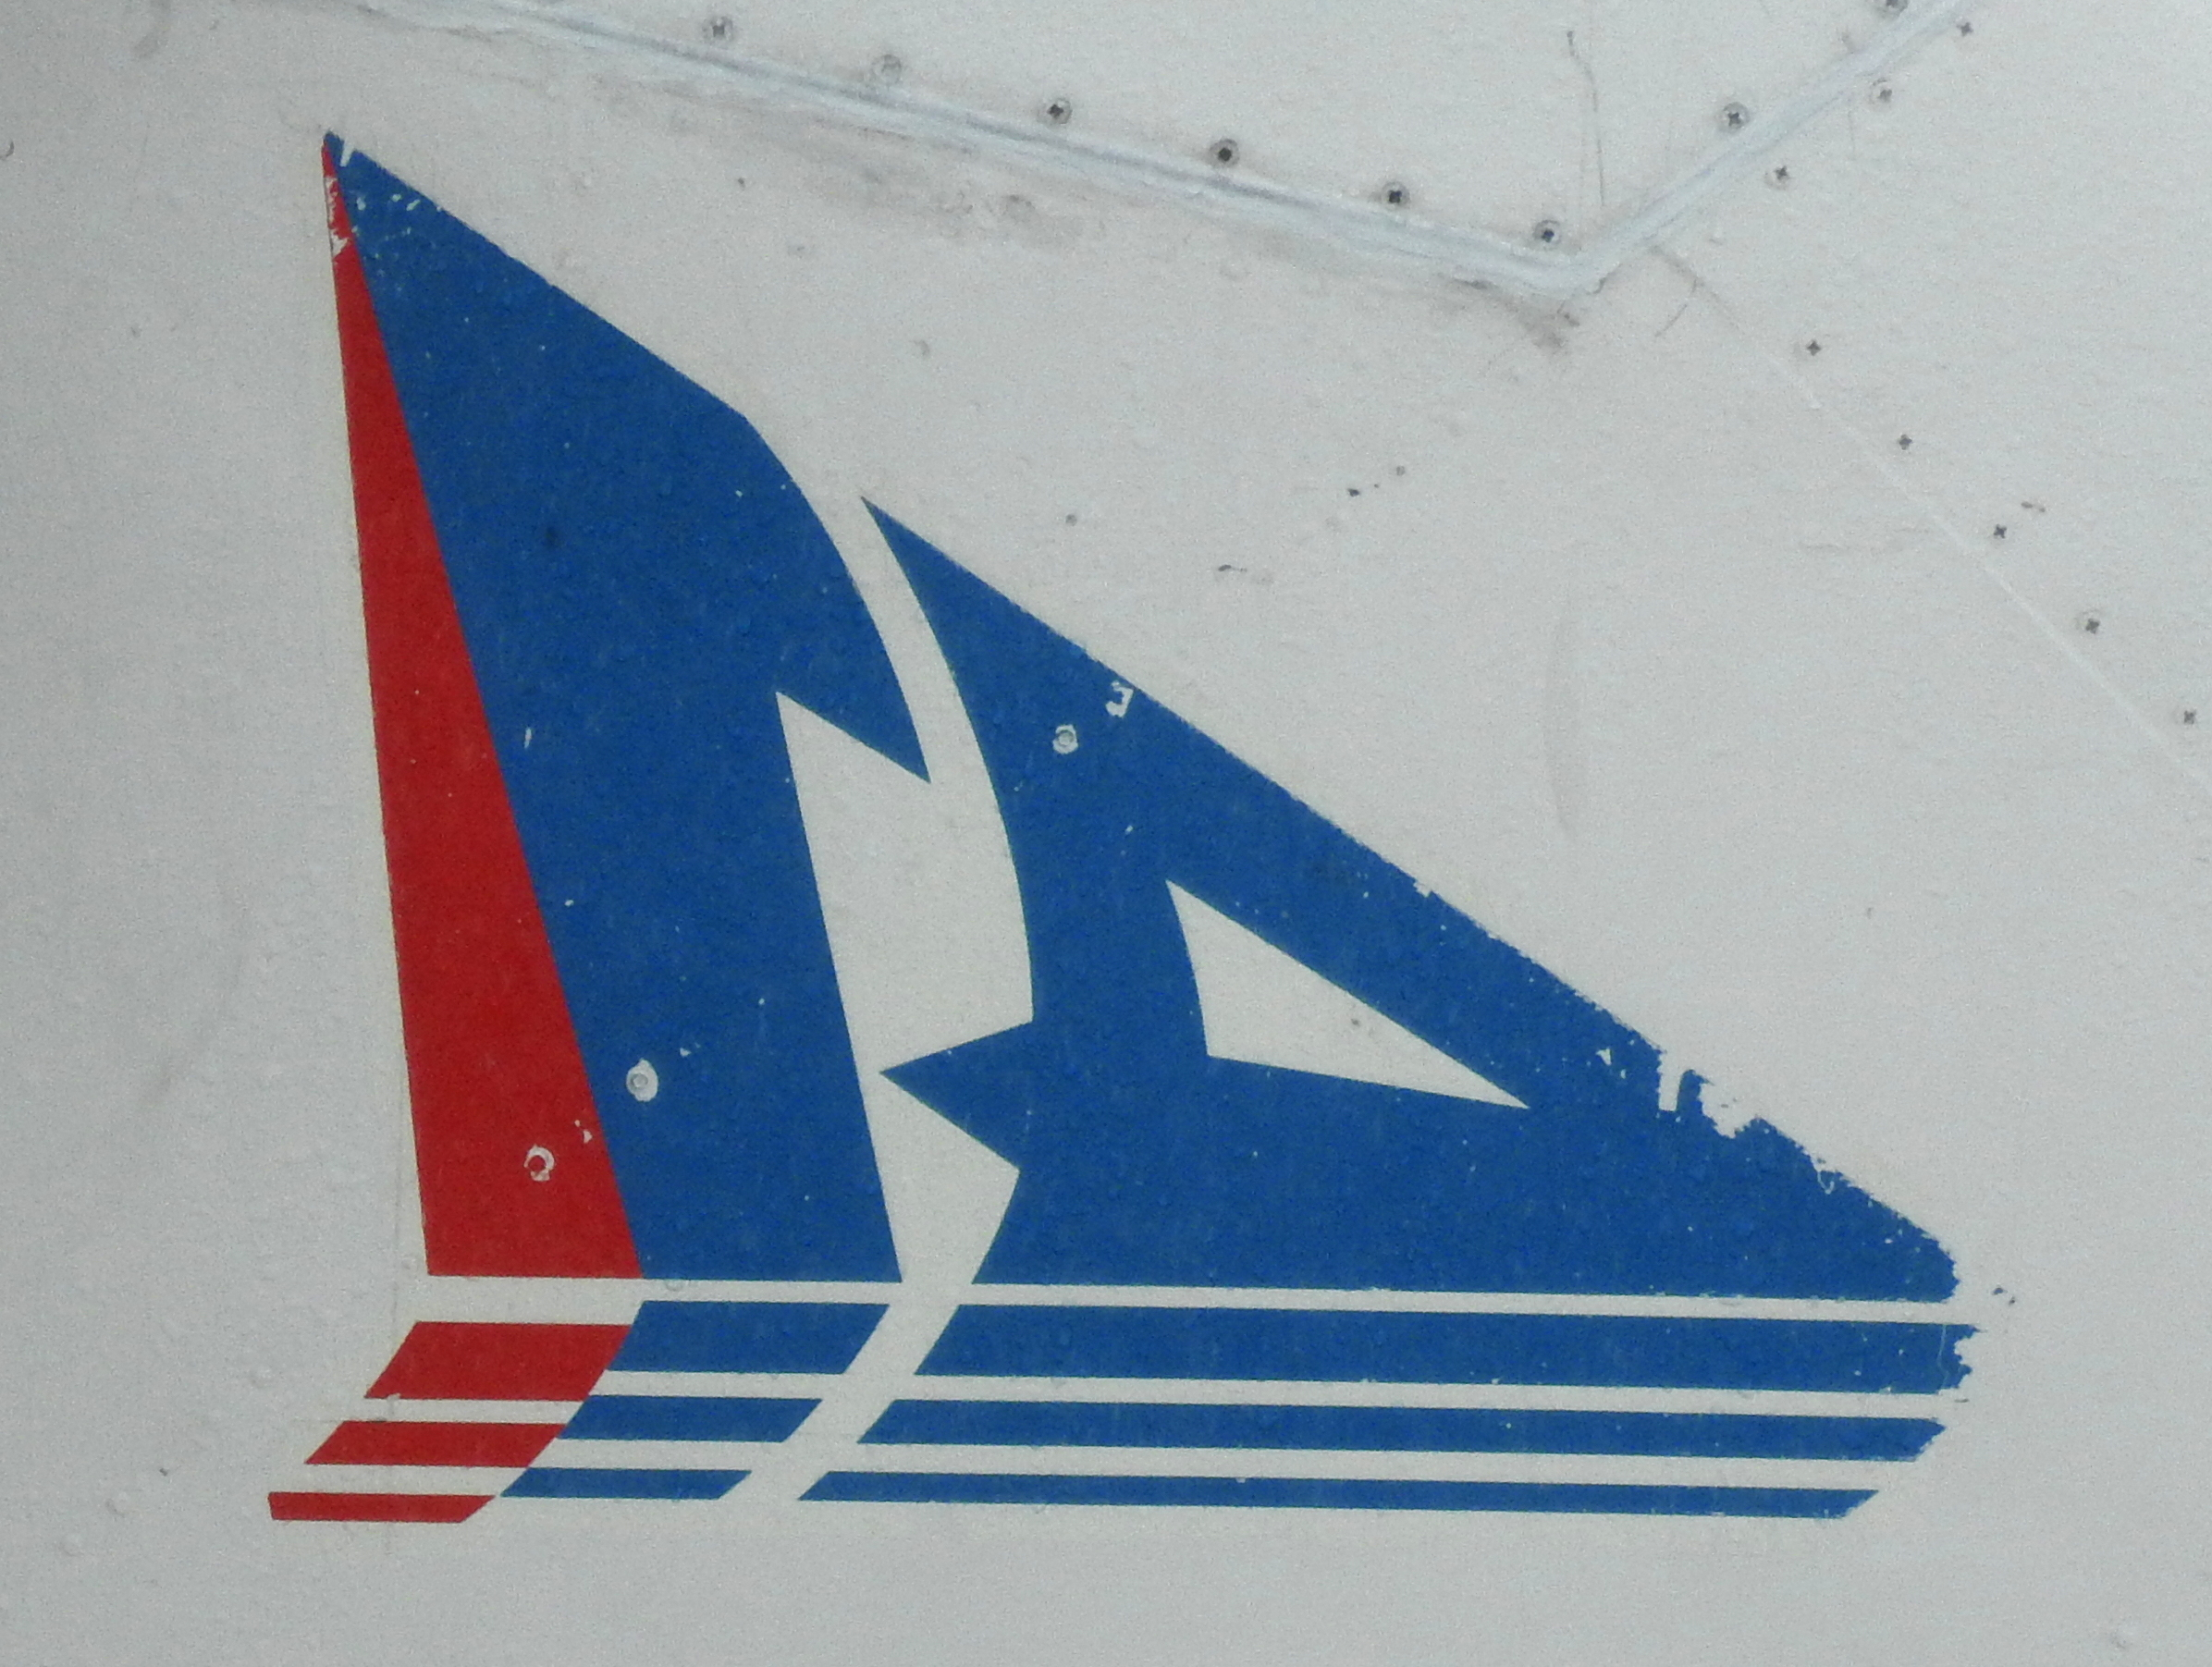 File:Stylized 41 tail marking of 41st Flight Training Squadron Japan